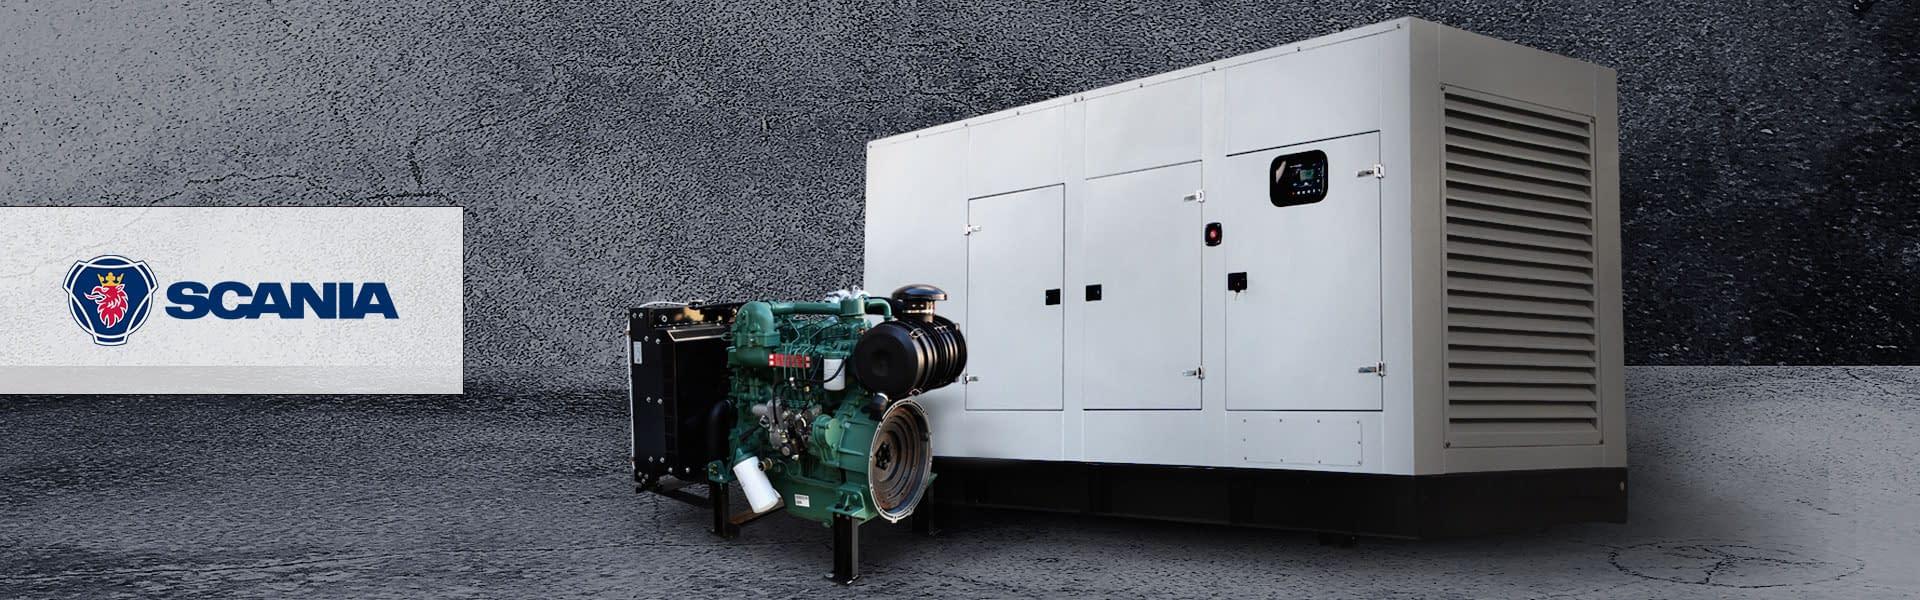 Scania Diesel Generator for Sale | Scania Generator South Africa | Generator King